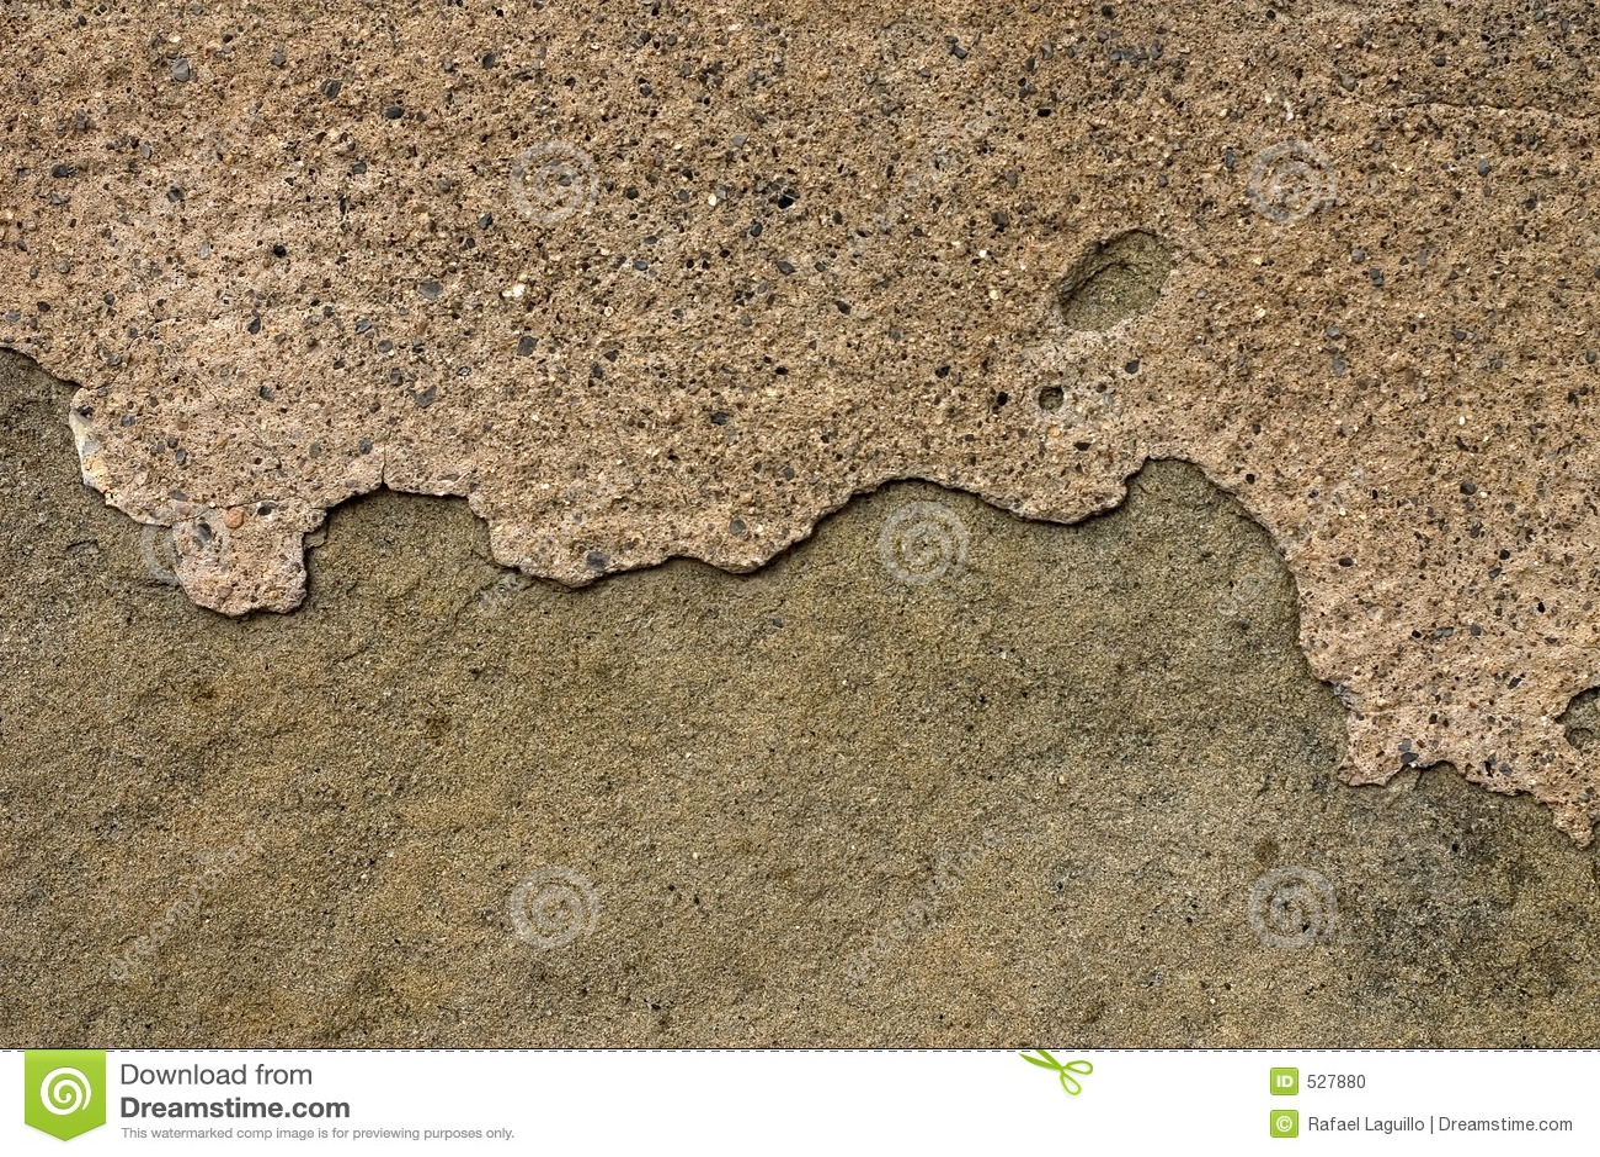 Download 纹理墙壁 库存照片. 图片 包括有 粗砺, 土气, 背包, 年龄, 表面, 膏药, 详细资料, 特写镜头, 谷物 - 527880